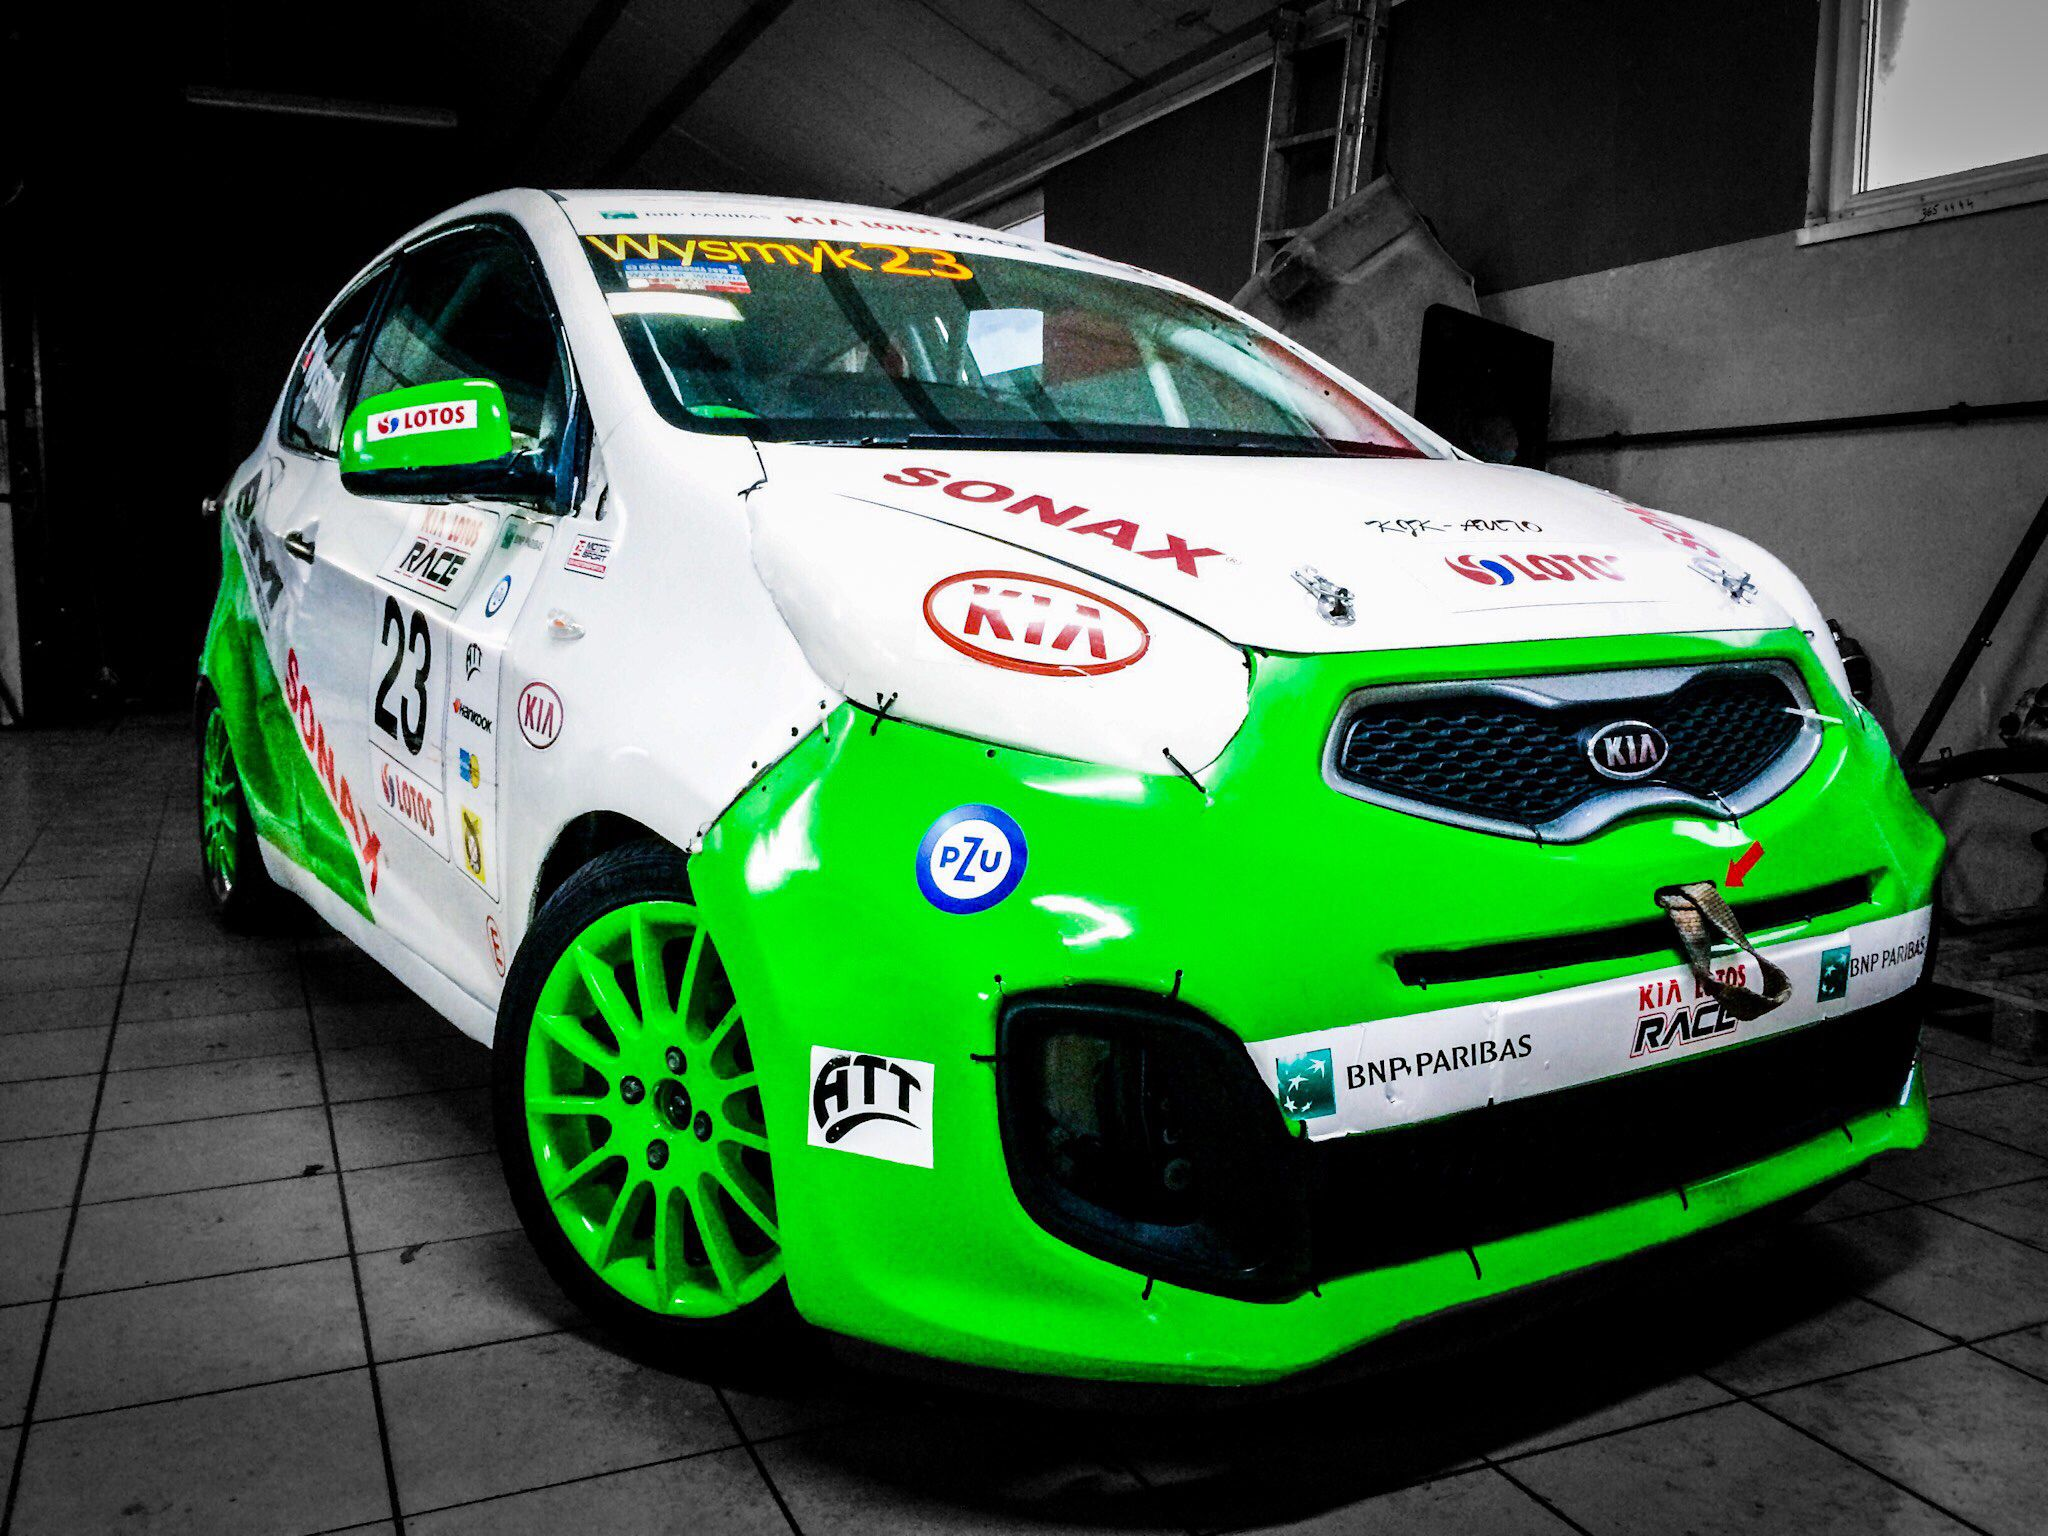 Kia picanto by bm racing team